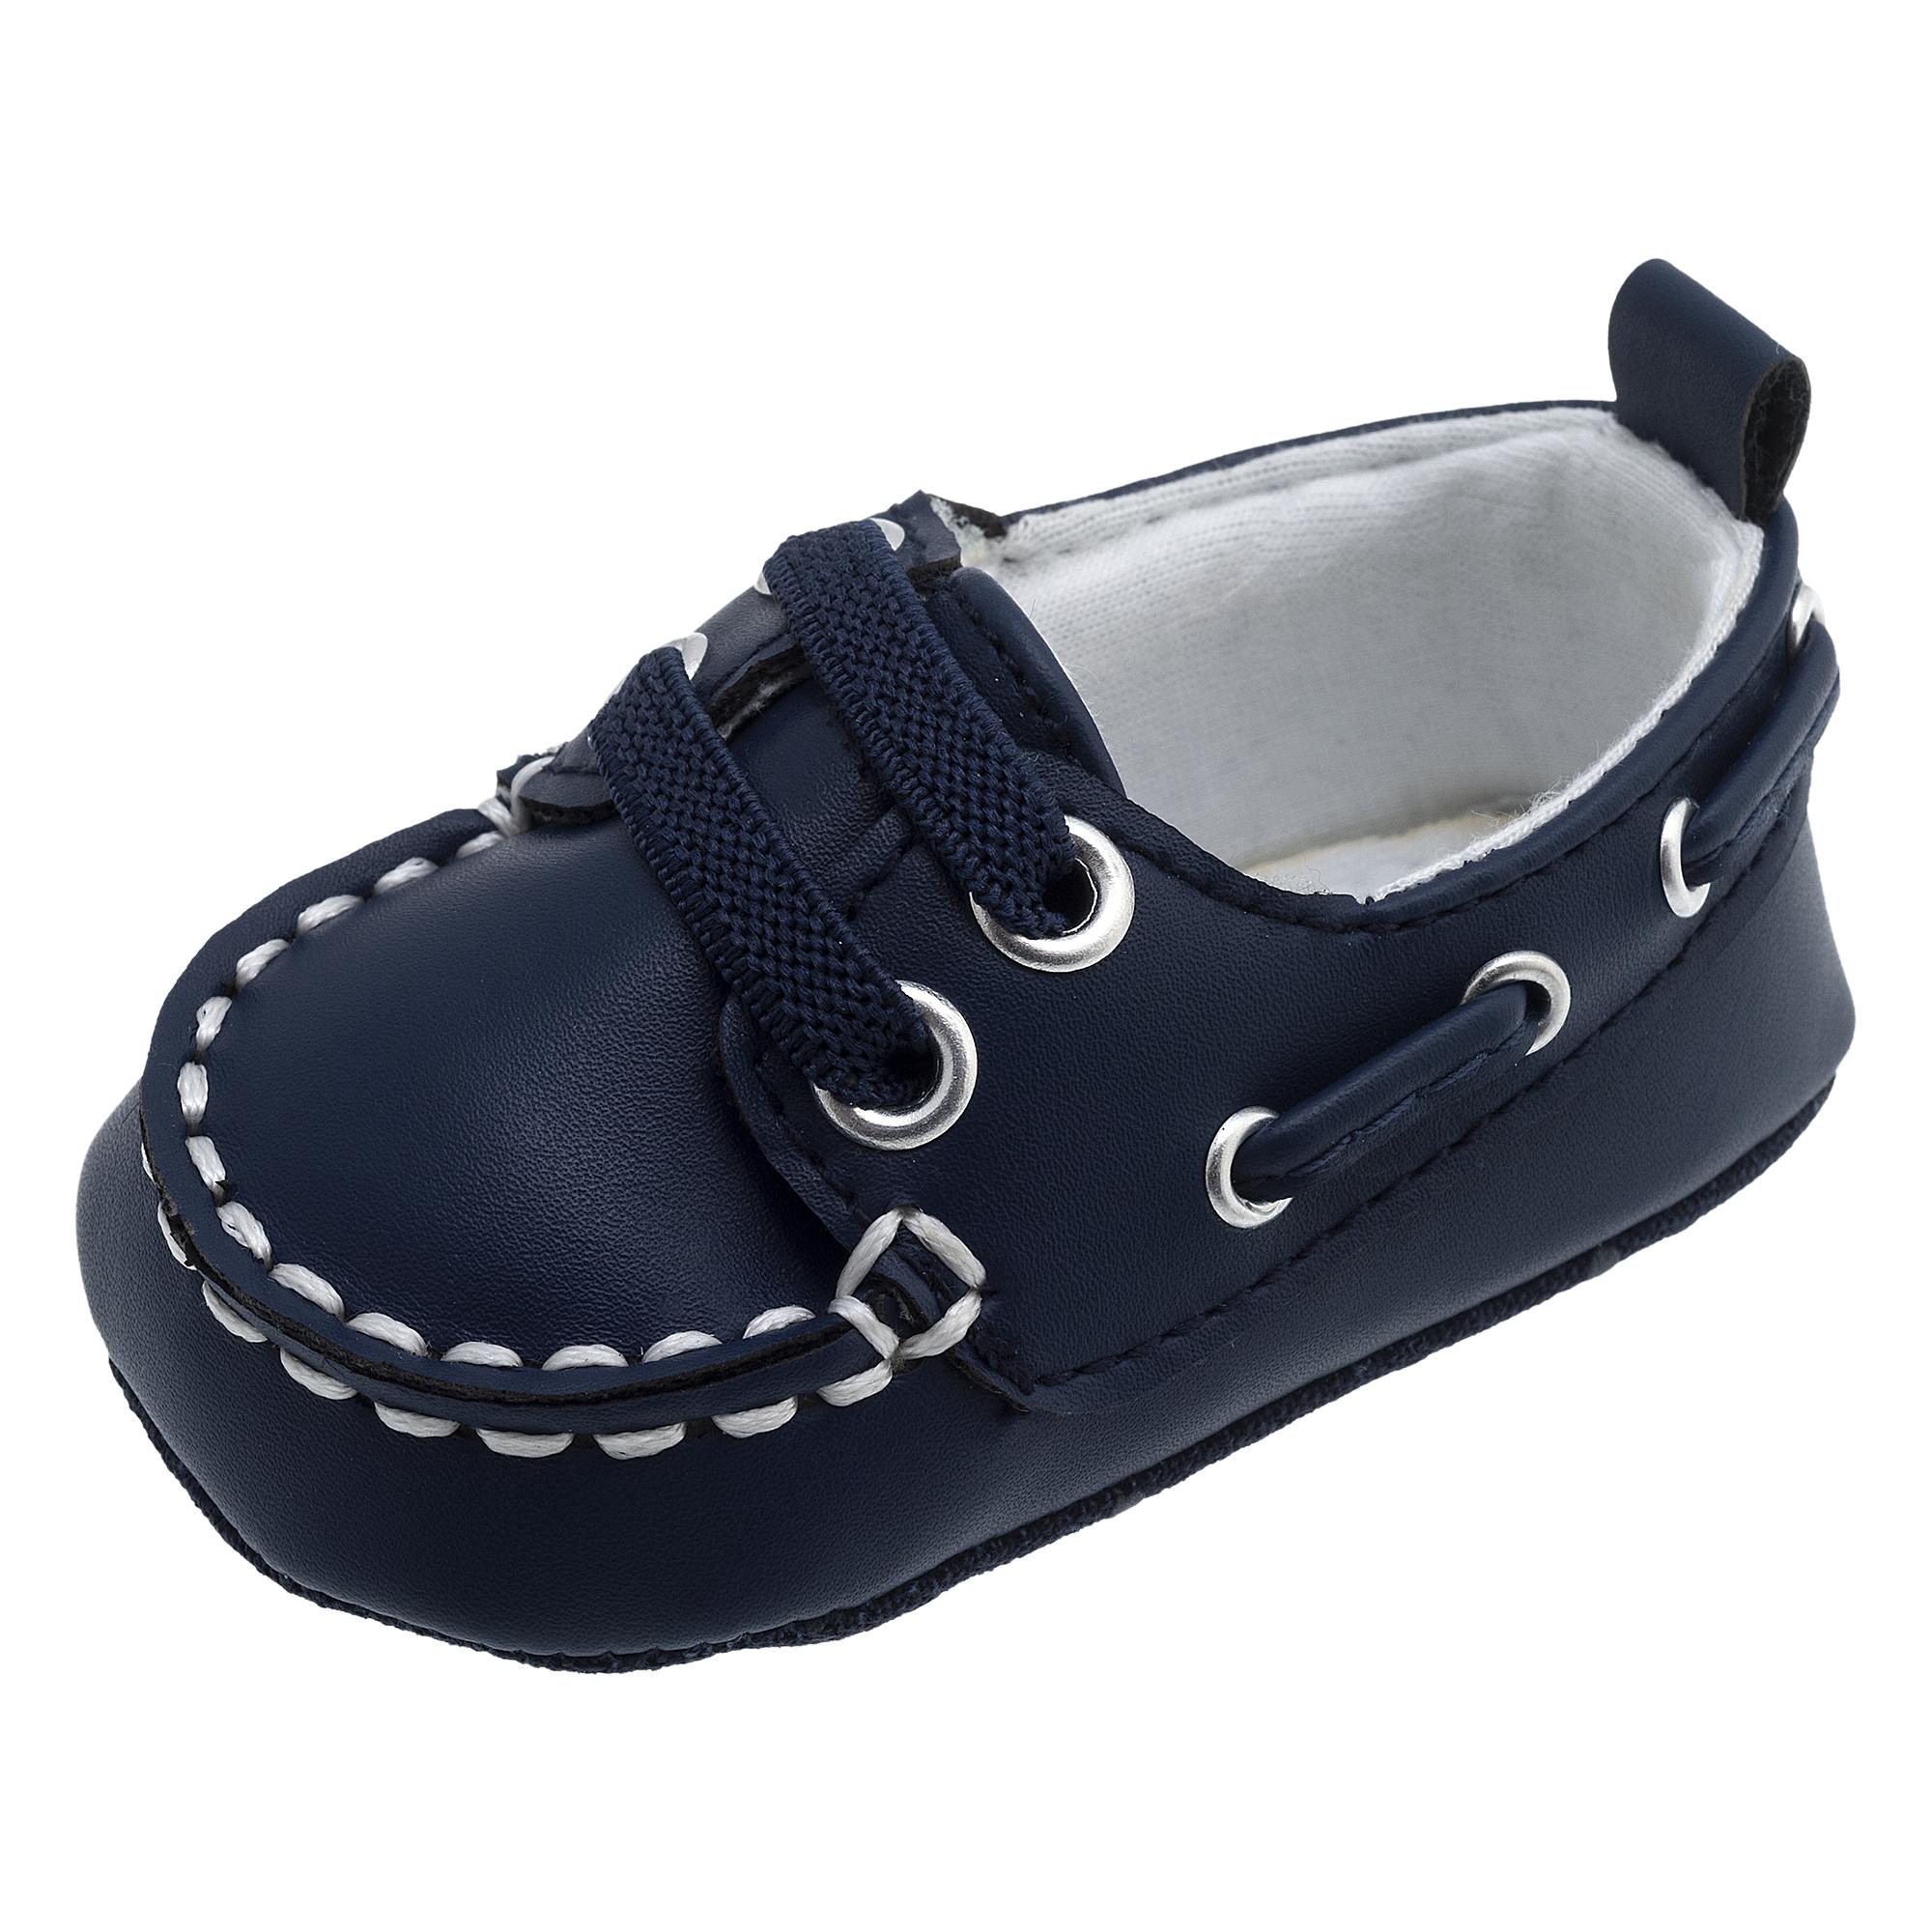 Pantofi Copii Chicco Orman Din Piele Nappa, Albastru, 63115 imagine